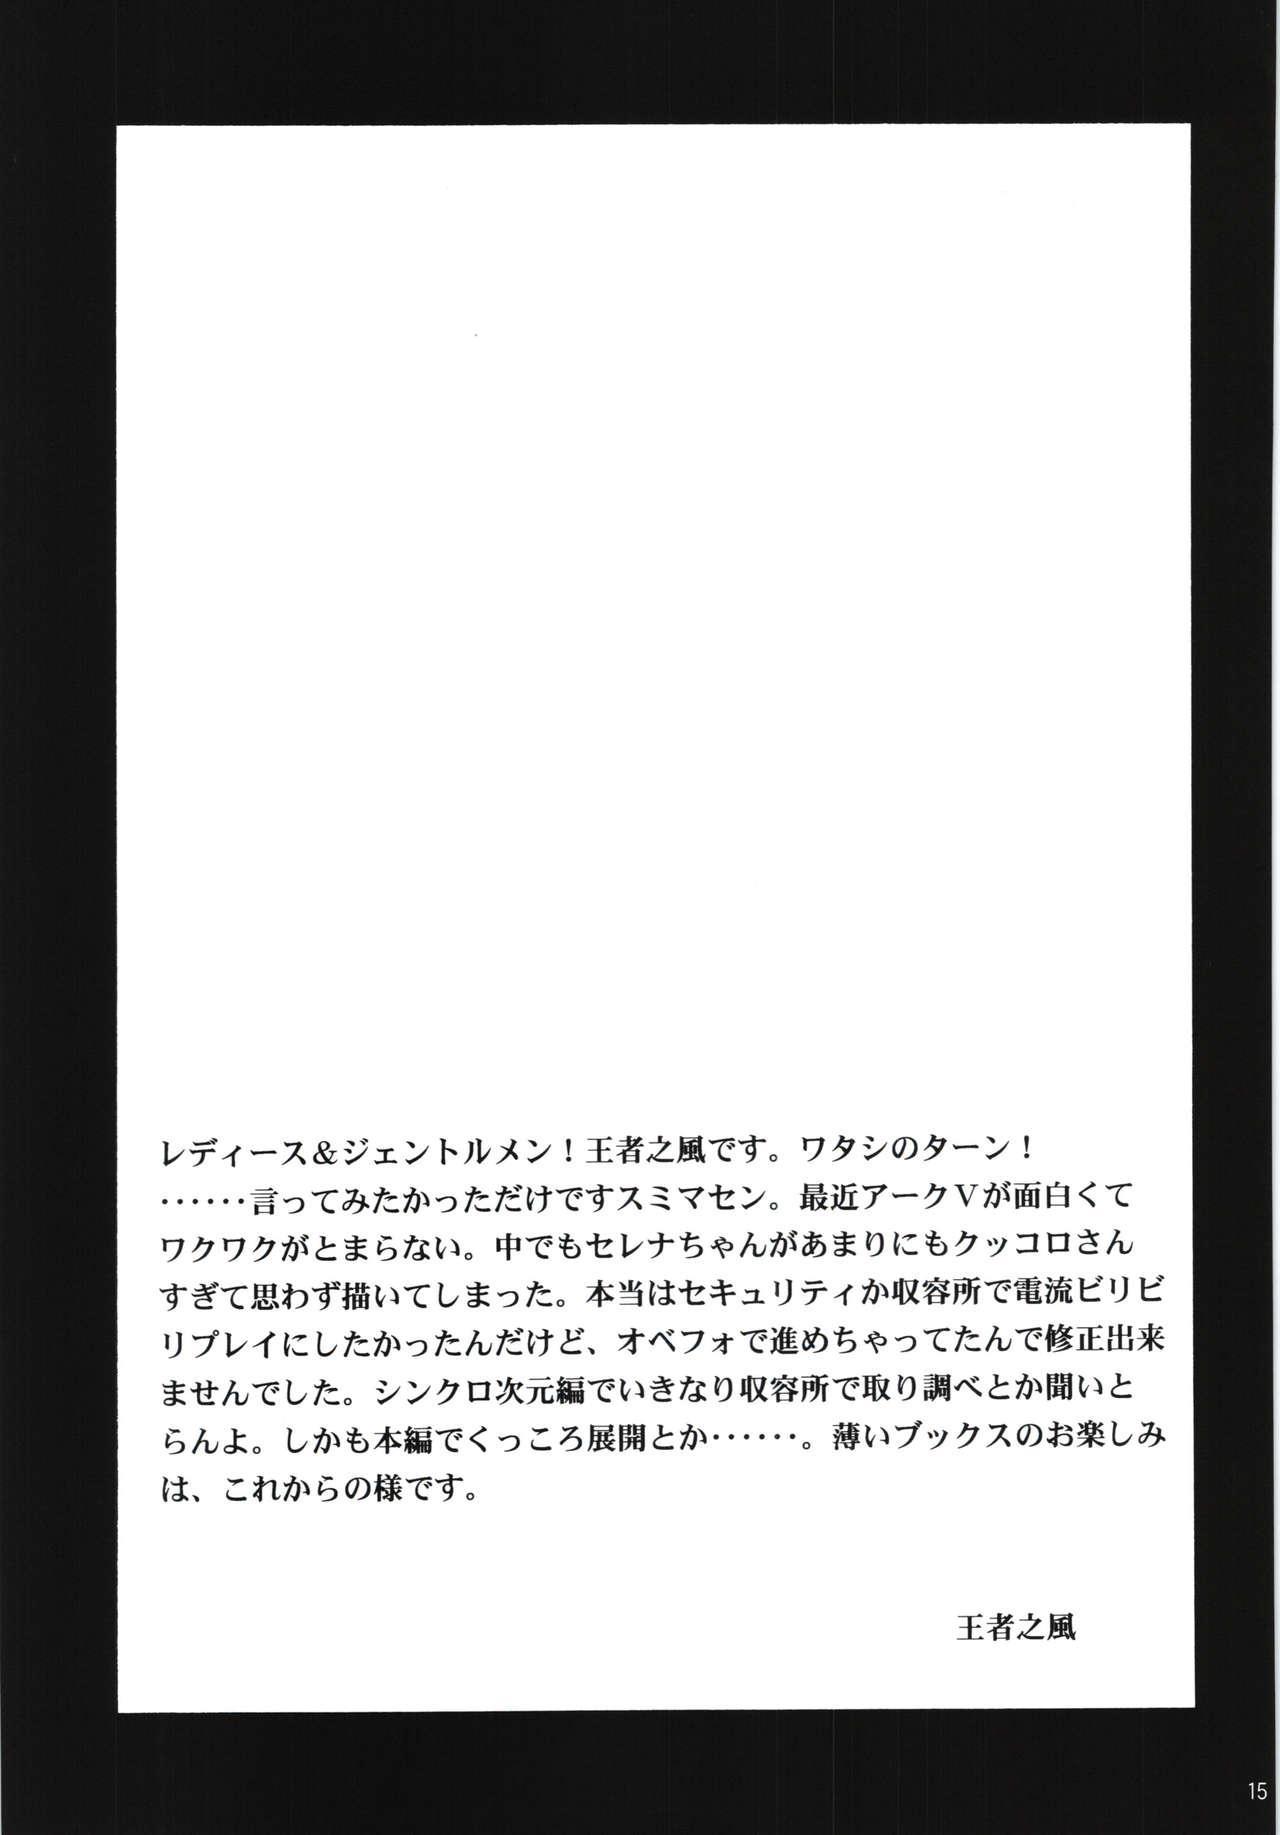 Ponkotsu Kukkoro Kettousha Serena-chan 16